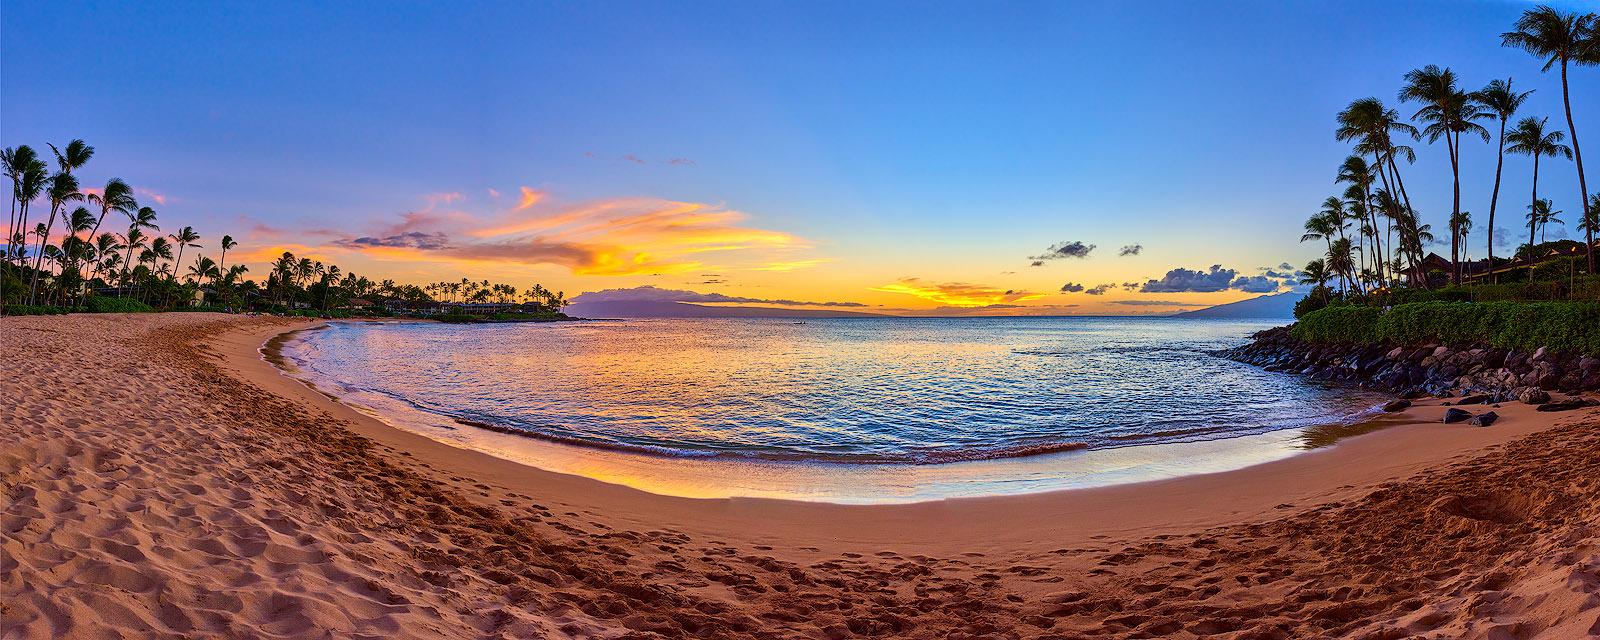 a beautiful sunset panorama of Napili Bay near Lahaina and Kaanapali on the island of Maui Hawaii.  Fine Art Hawaii Sunset picture by artist Andrew Shoemaker